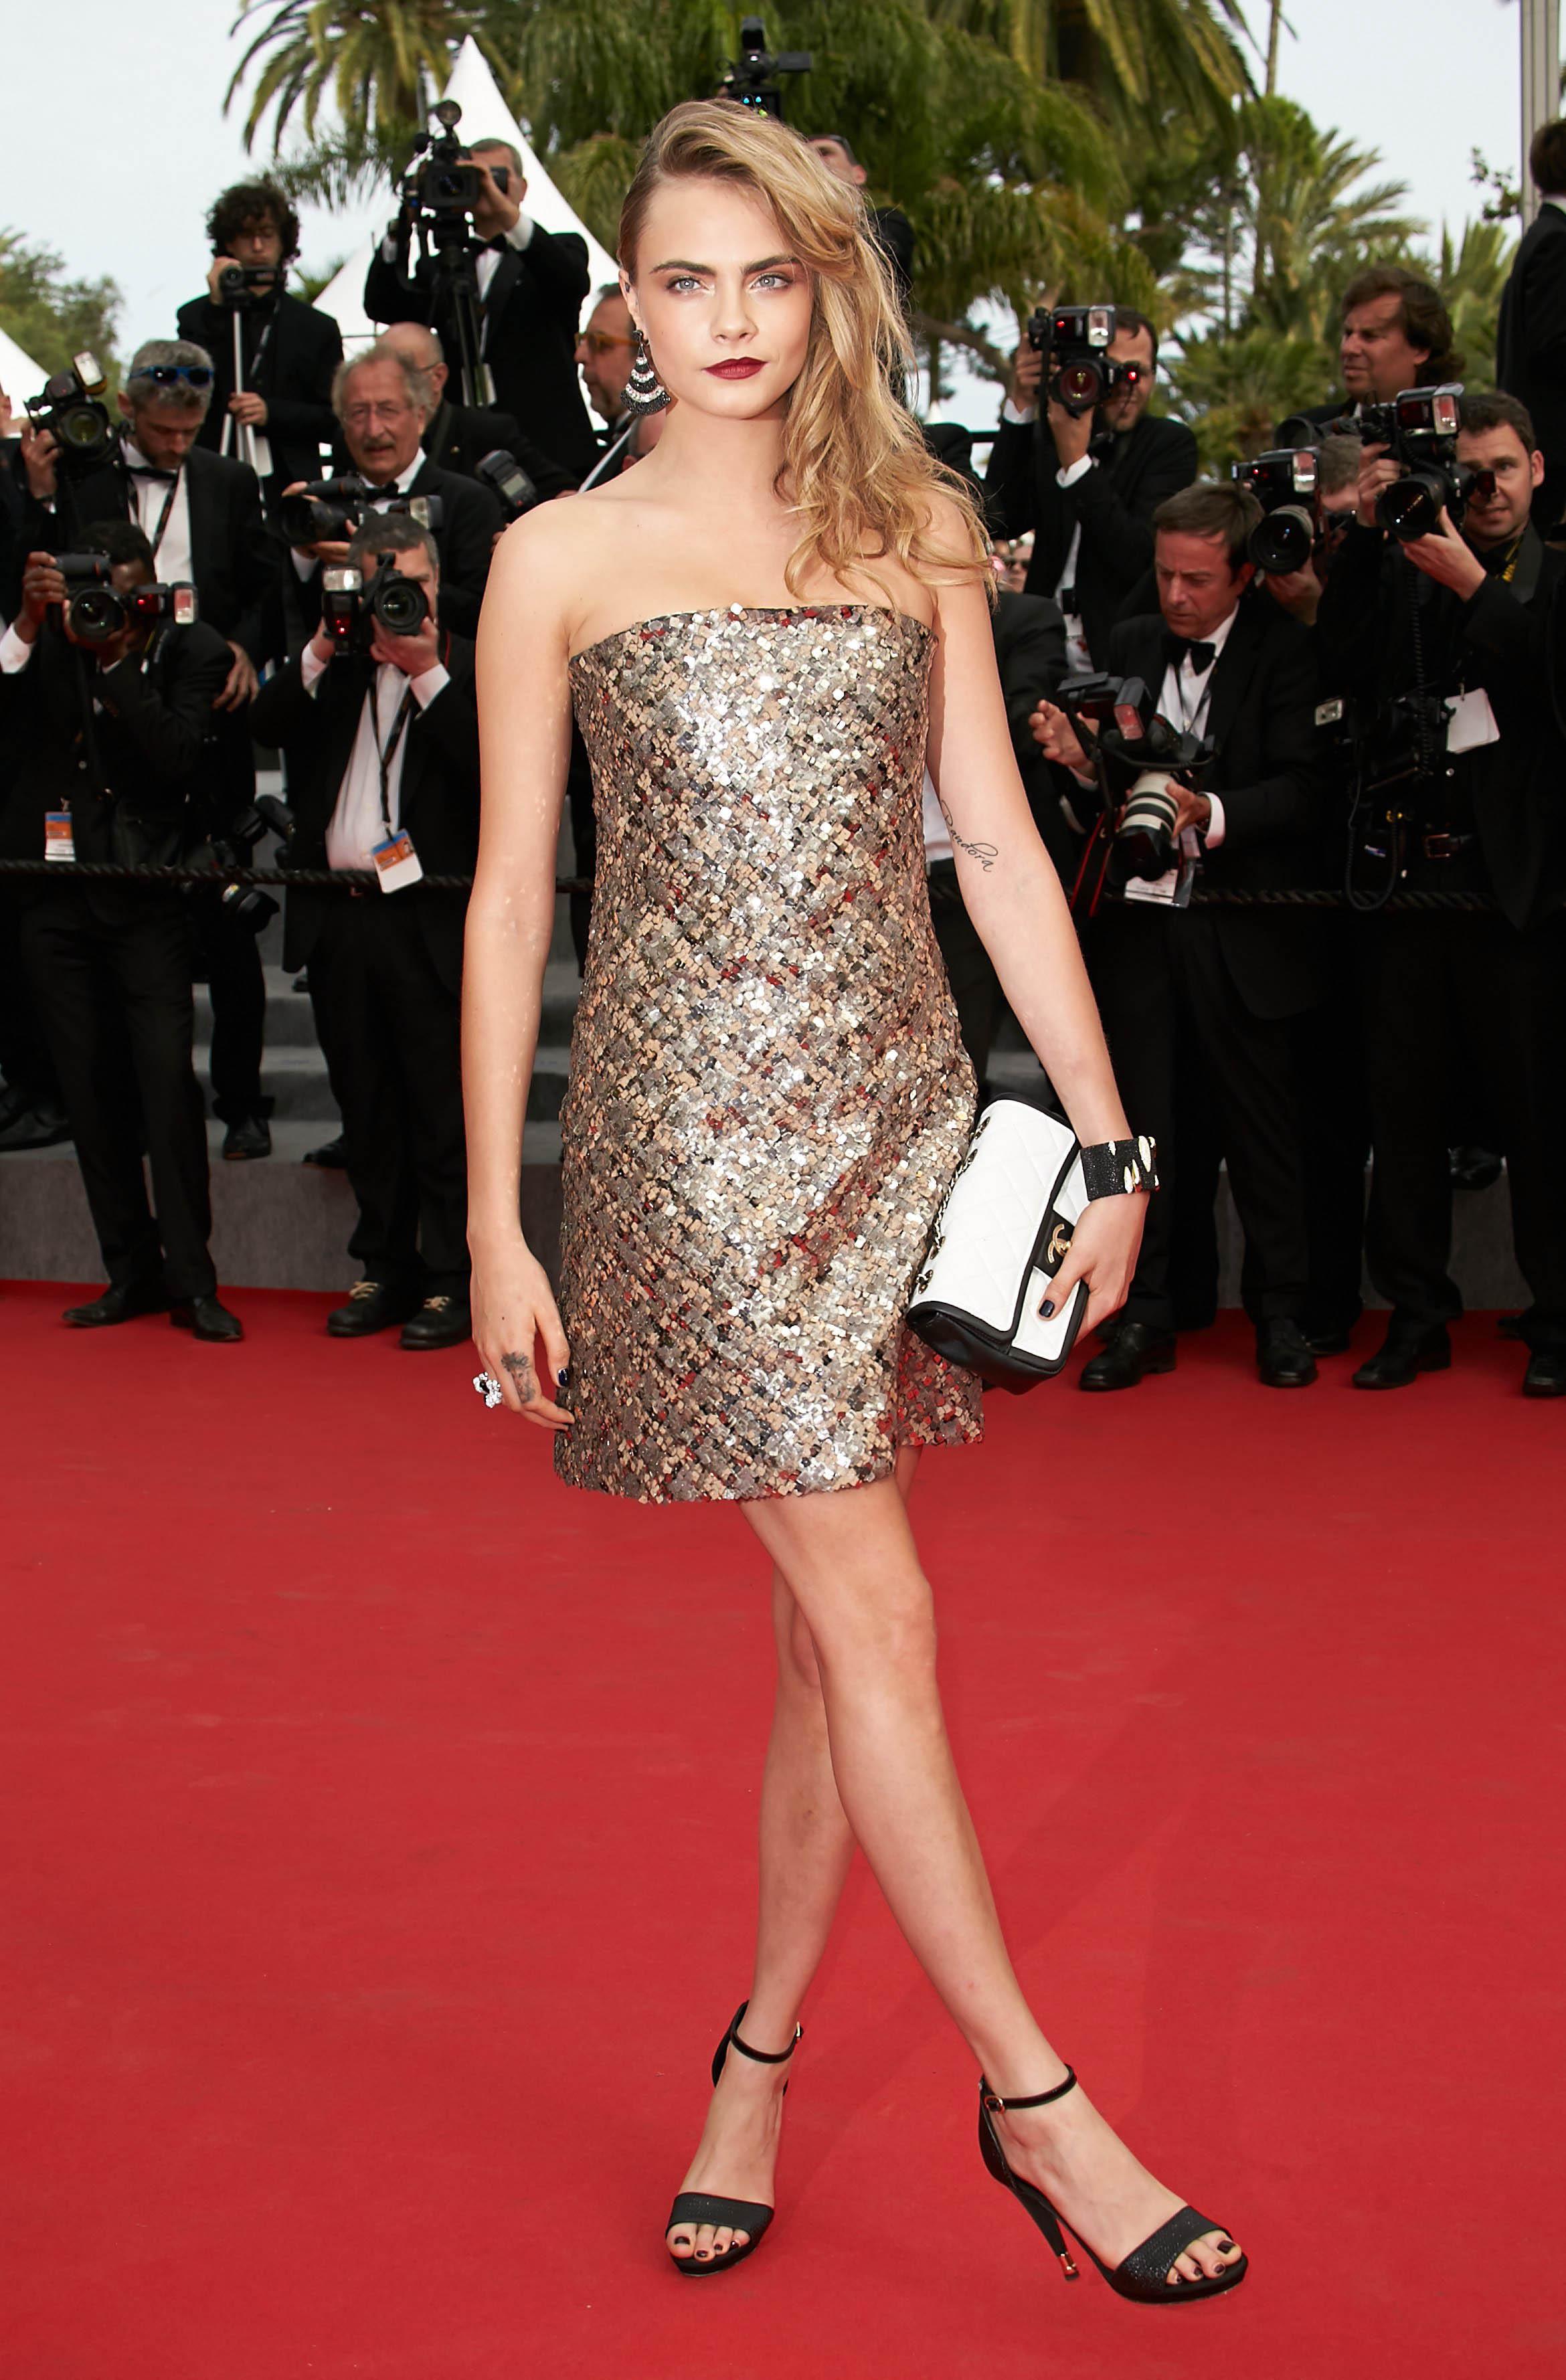 Cara Delevingne's Soles : celebrity_soles - reddit.com